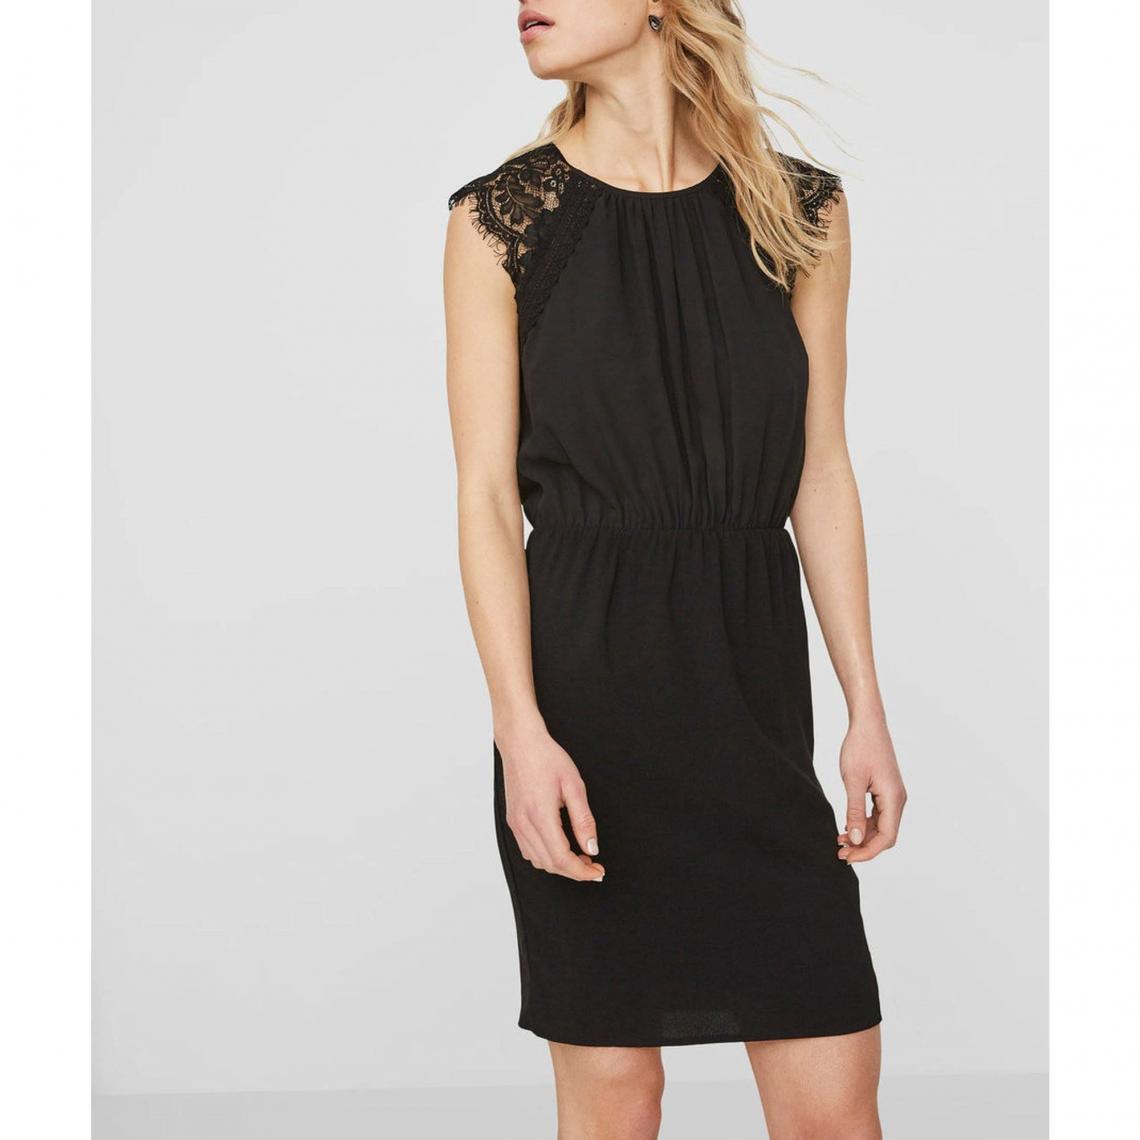 fc60322e4ba Robe courte bi-matière femme Vero Moda - Noir Vero Moda Femme